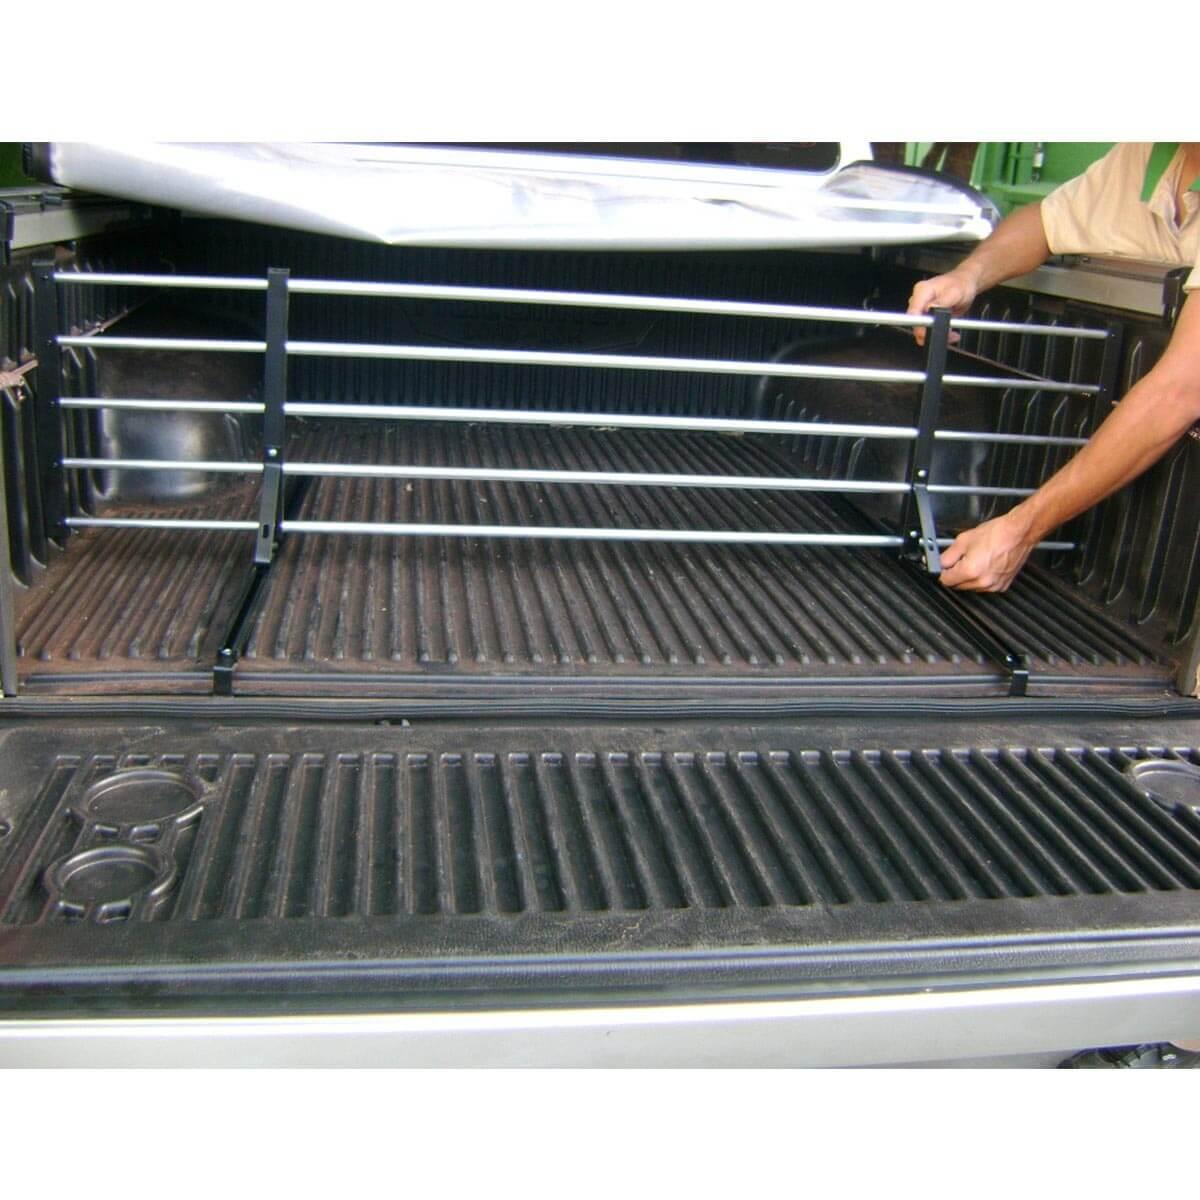 Divisor separador de cargas caçamba L200 Sport 2004 a 2007 ou L200 Outdoor 2007 a 2012